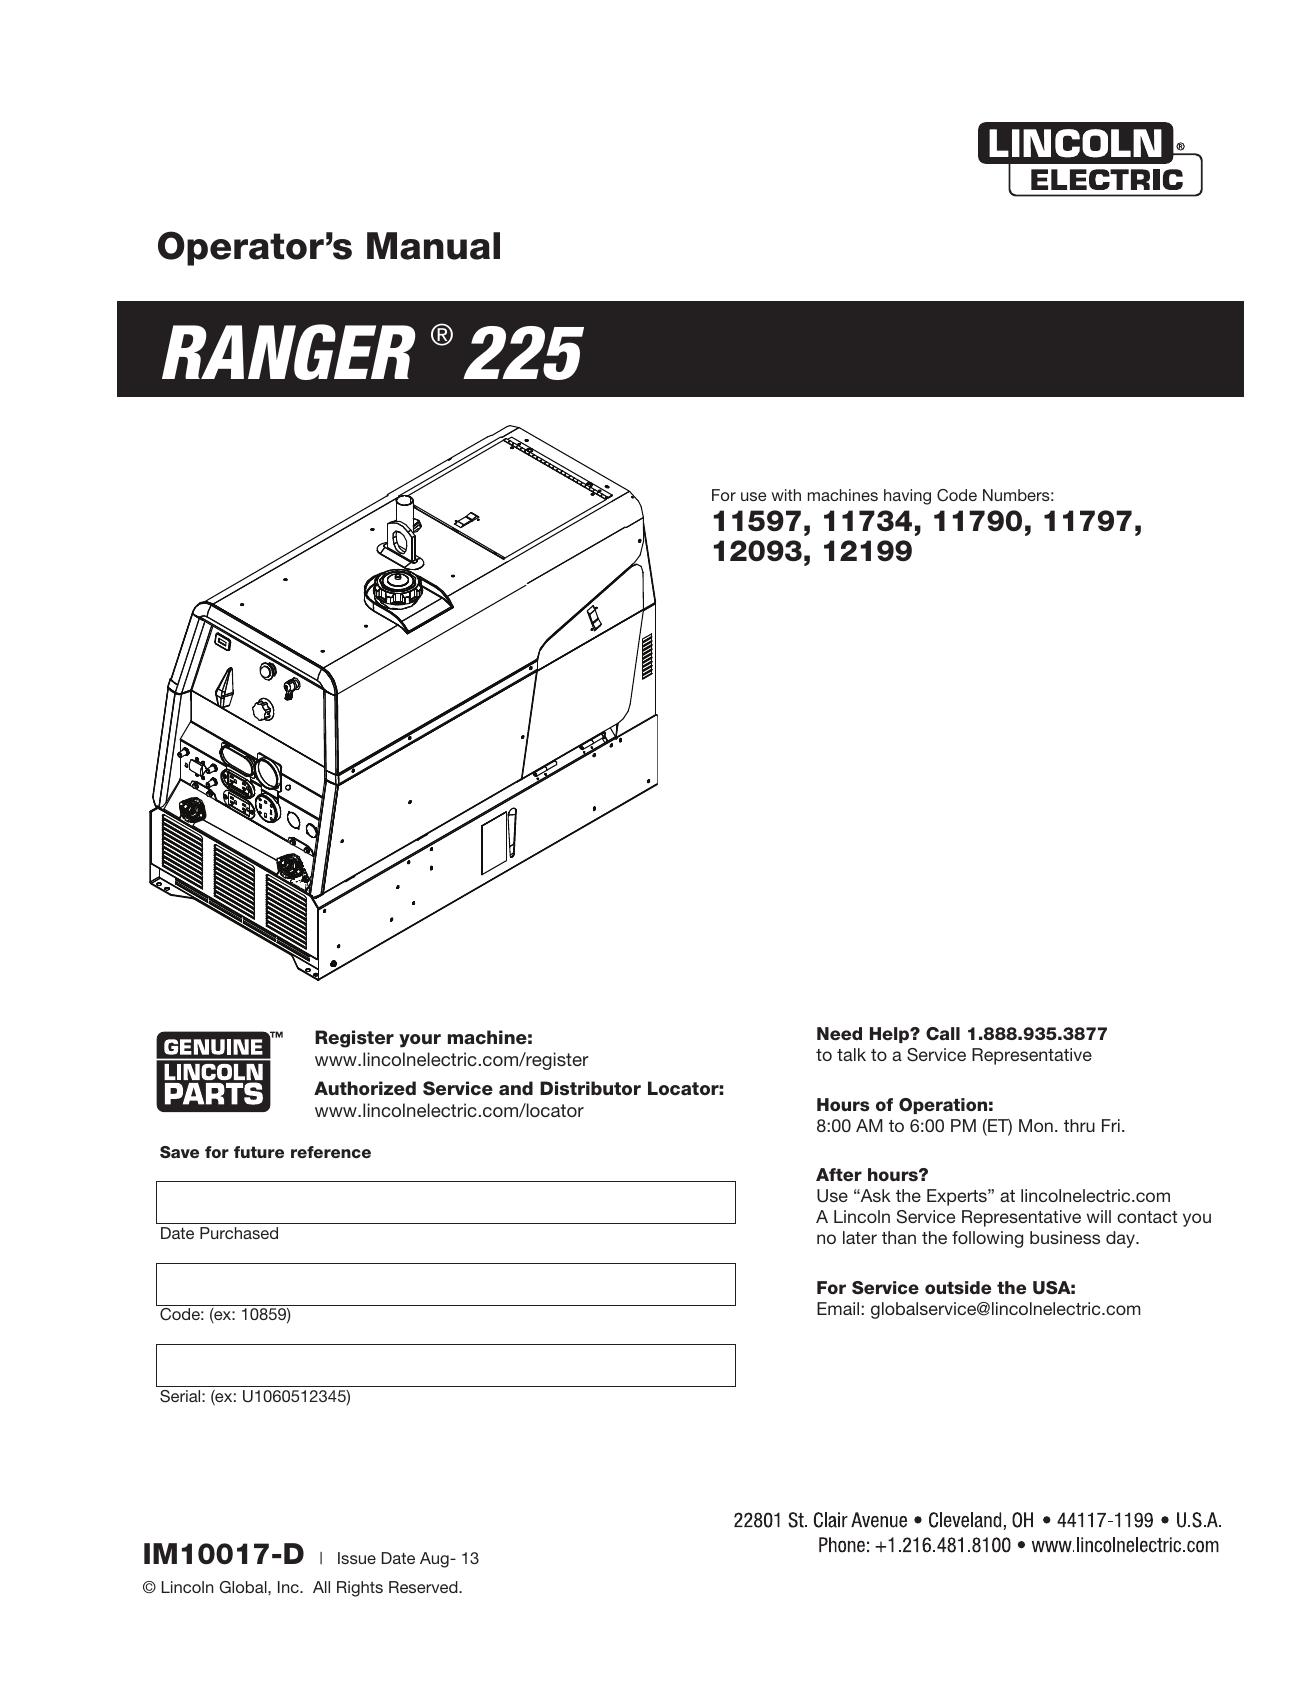 Lincoln Electric Ranger 225 - 12199 Operator Manual   Manualzzmanualzz